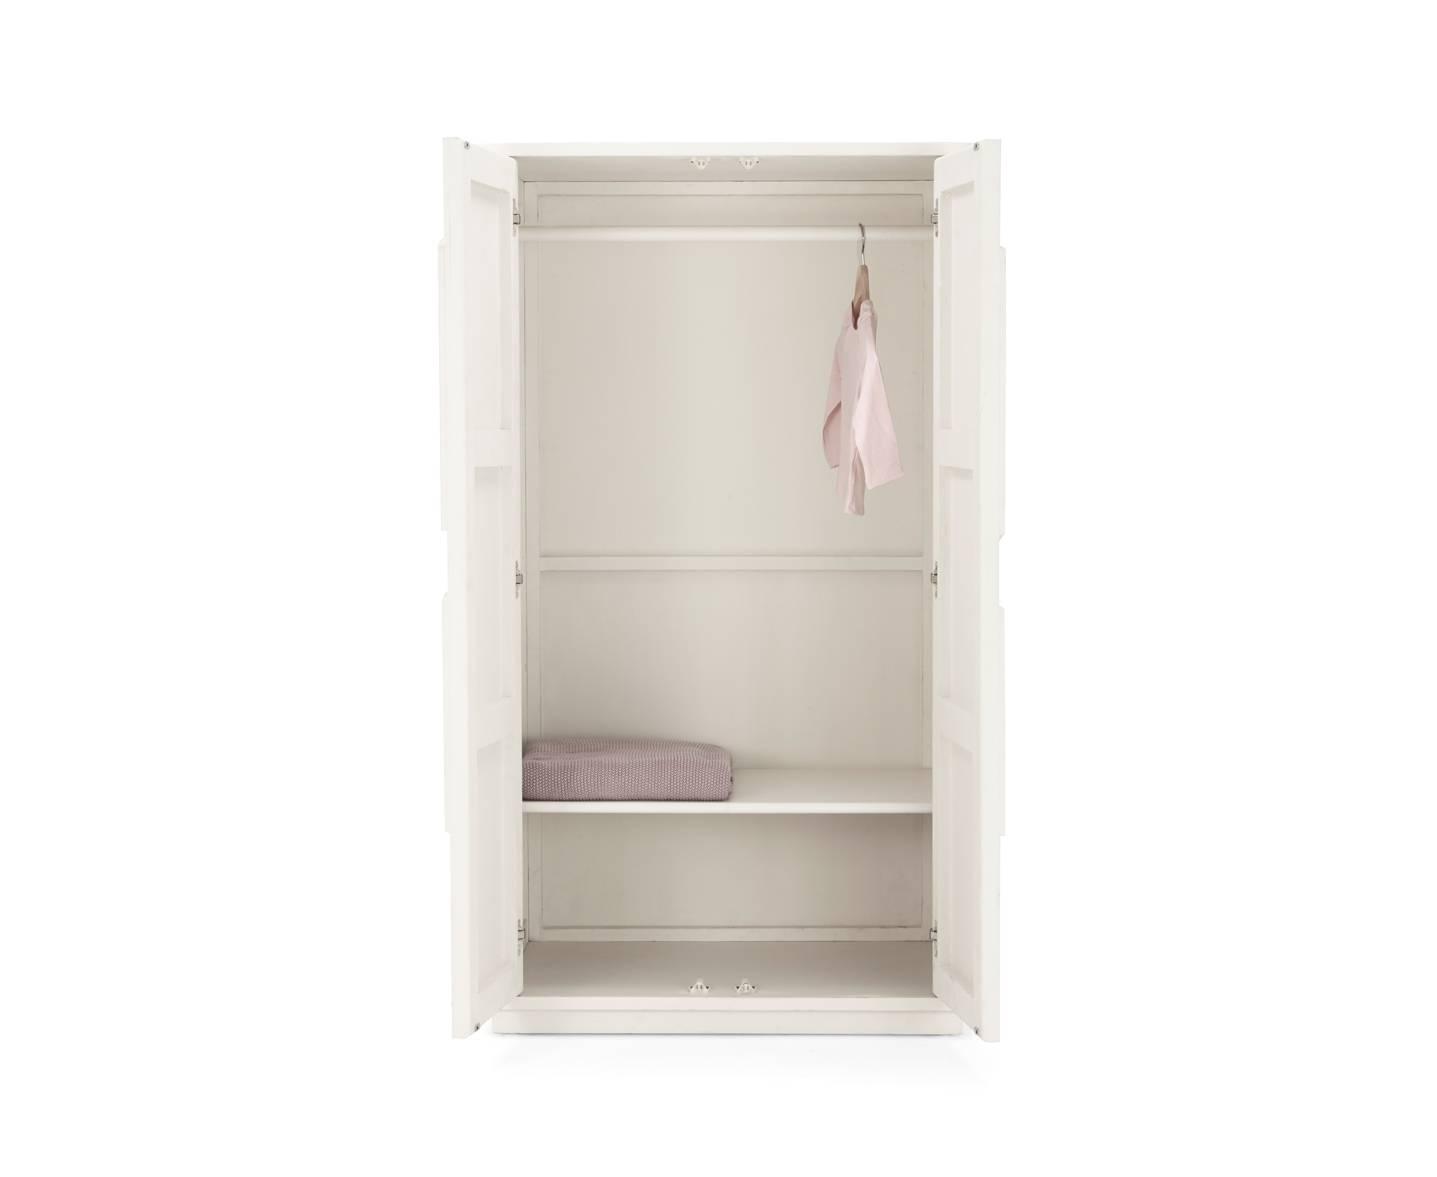 Clobber Children's Wardrobe | Kids' White Wardrobe | Loaf intended for Childrens Wardrobes White (Image 9 of 15)